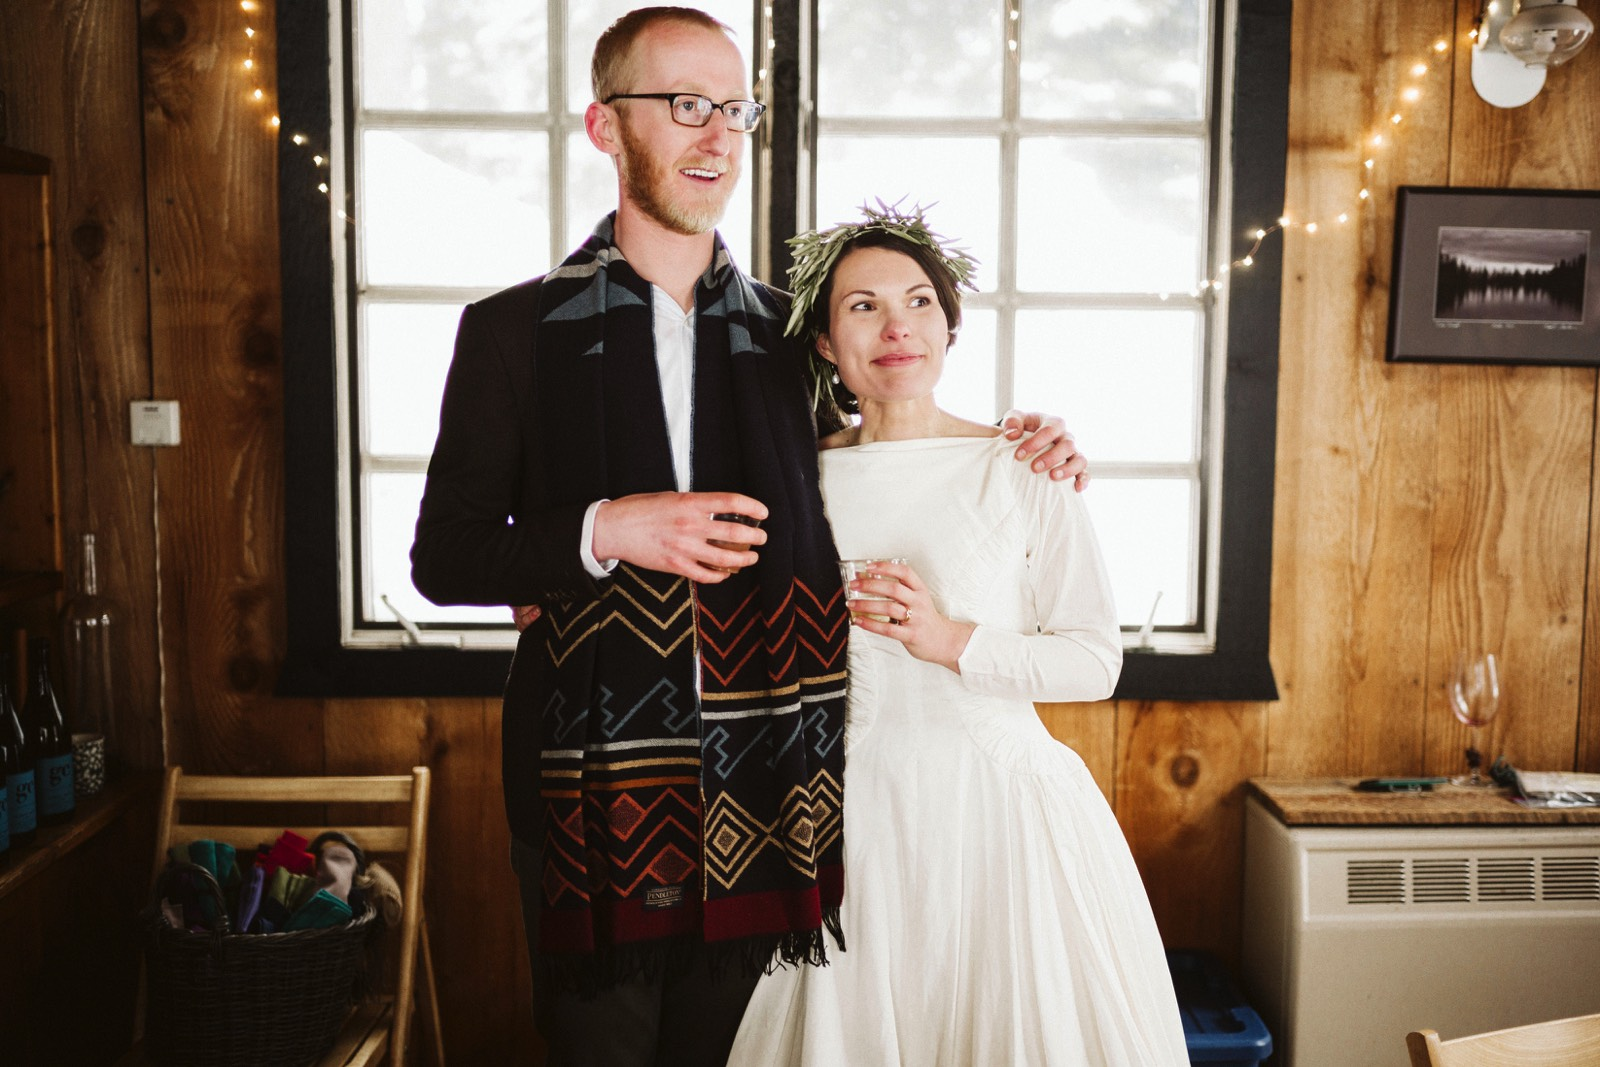 alpine-lakes-high-camp-winter-wedding-76 ALPINE LAKES HIGH CAMP WEDDING